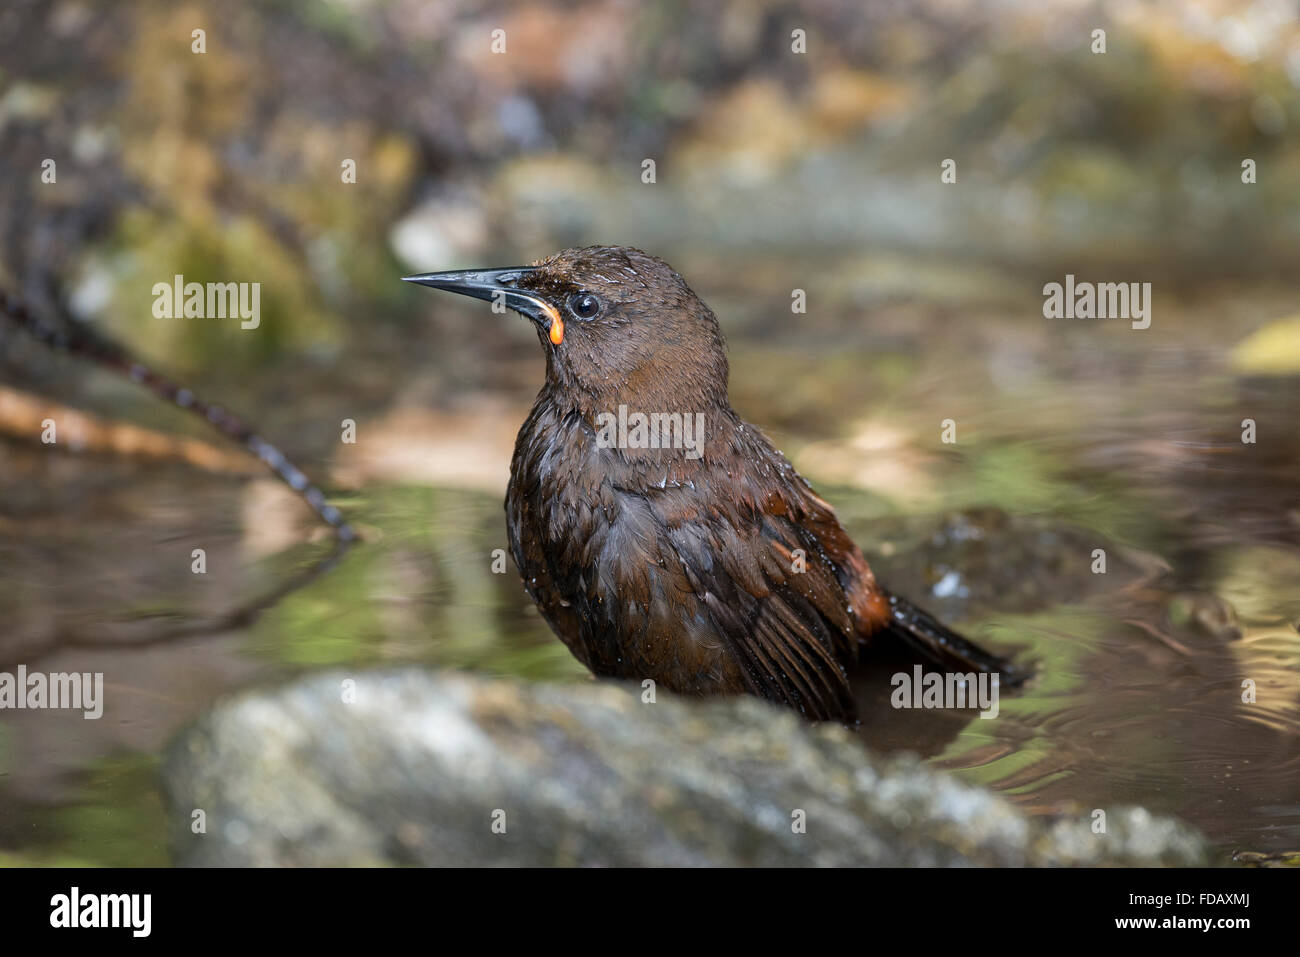 New Zealand, Marlborough Sounds, Motuara Island aka Motu Ara. Predator-free island bird reserve. Female South Island saddleback. Stock Photo